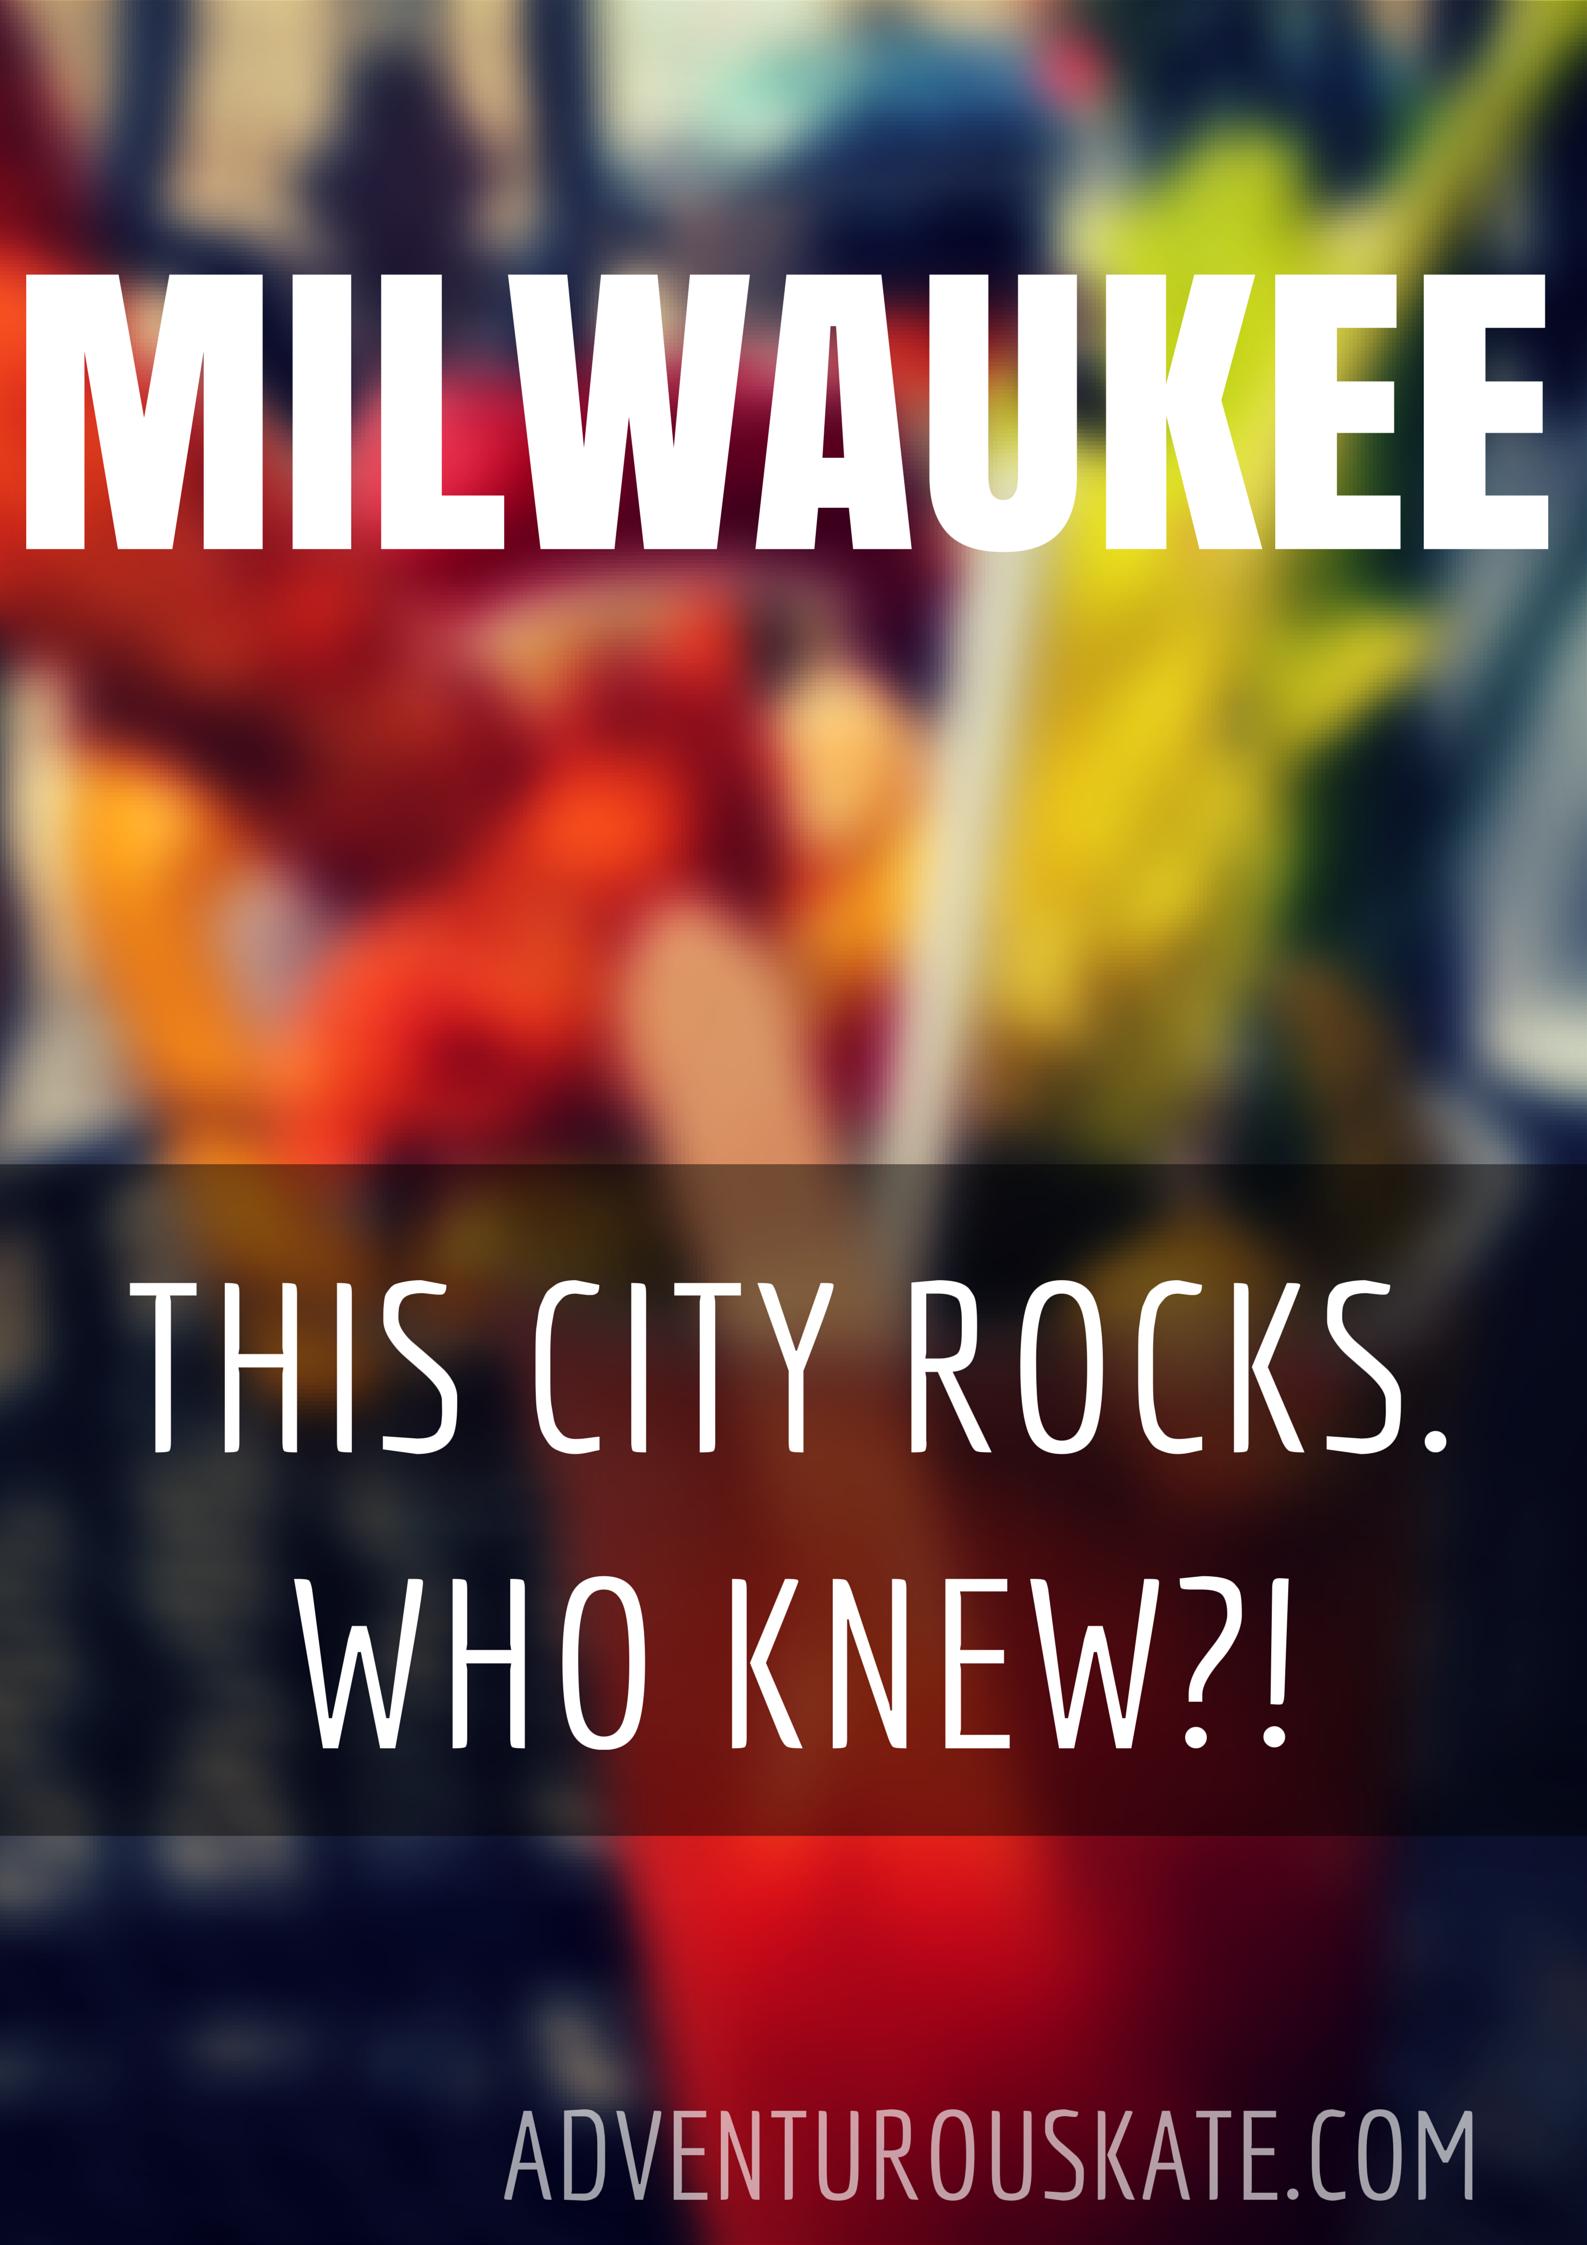 Milwaukee rocks. Who knew?! via Adventurous Kate